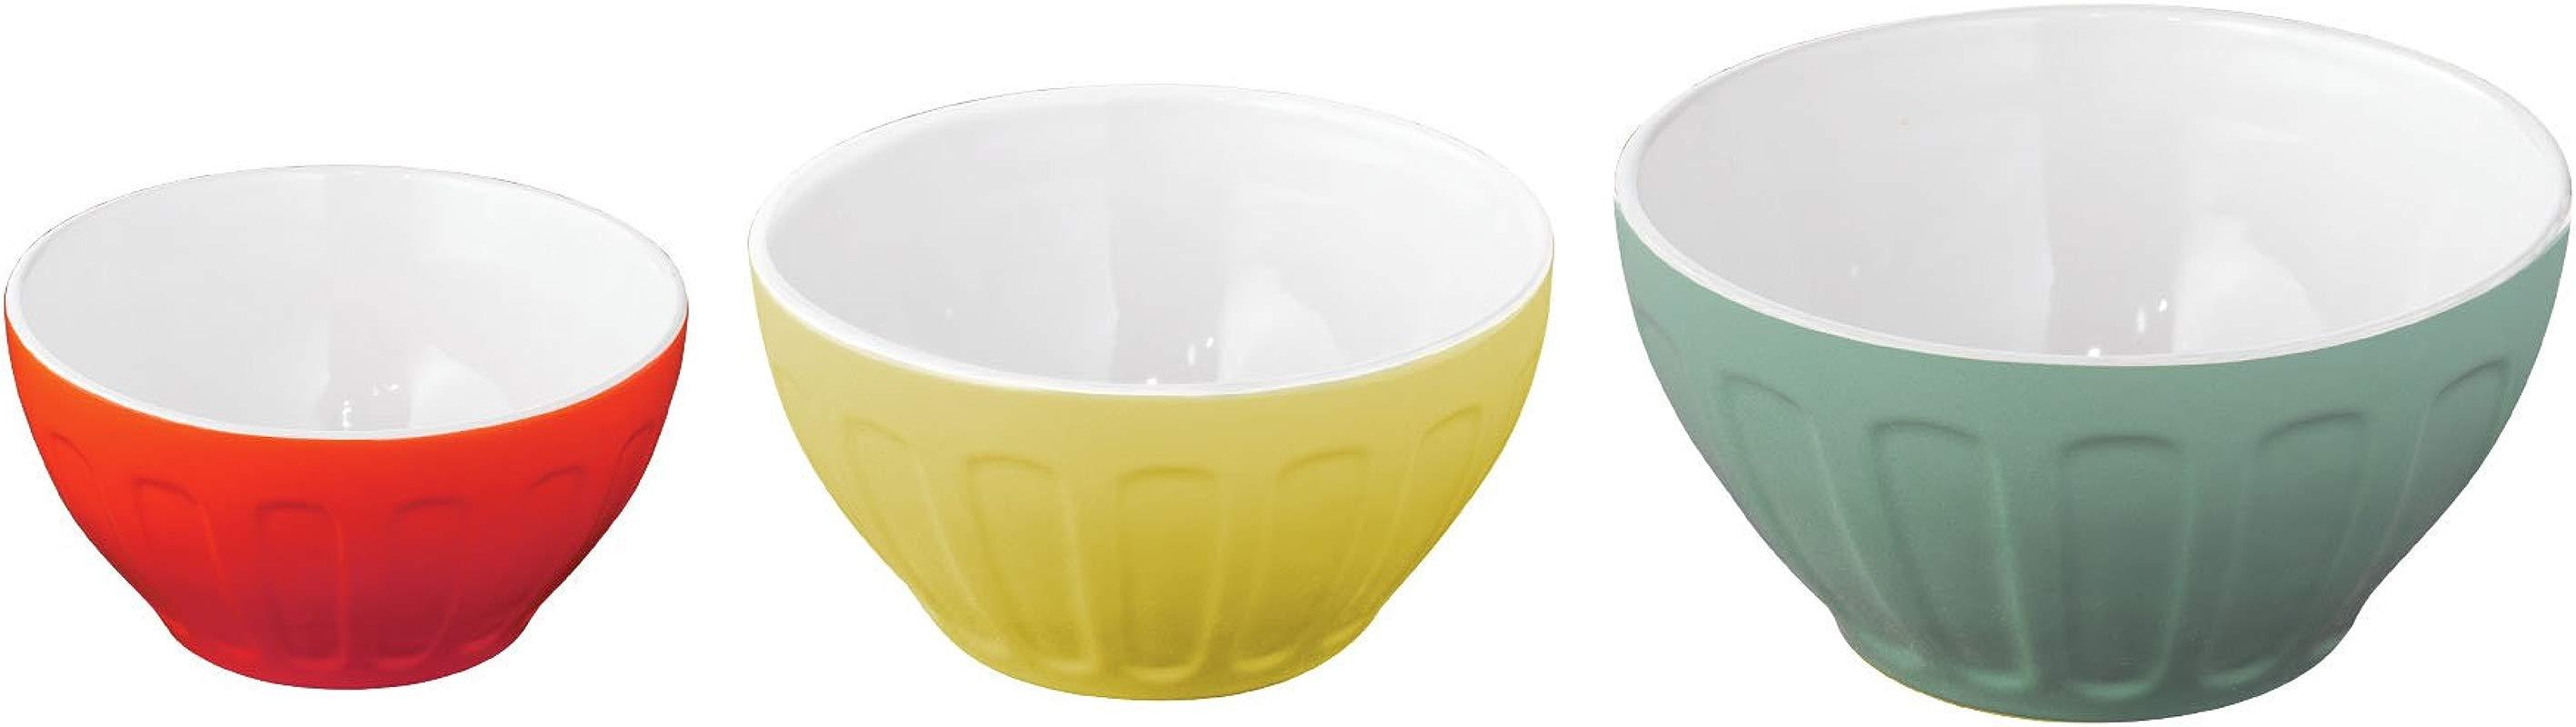 Good Cook OvenFresh Stoneware 3 Piece Mixing Bowl Set Multicolor